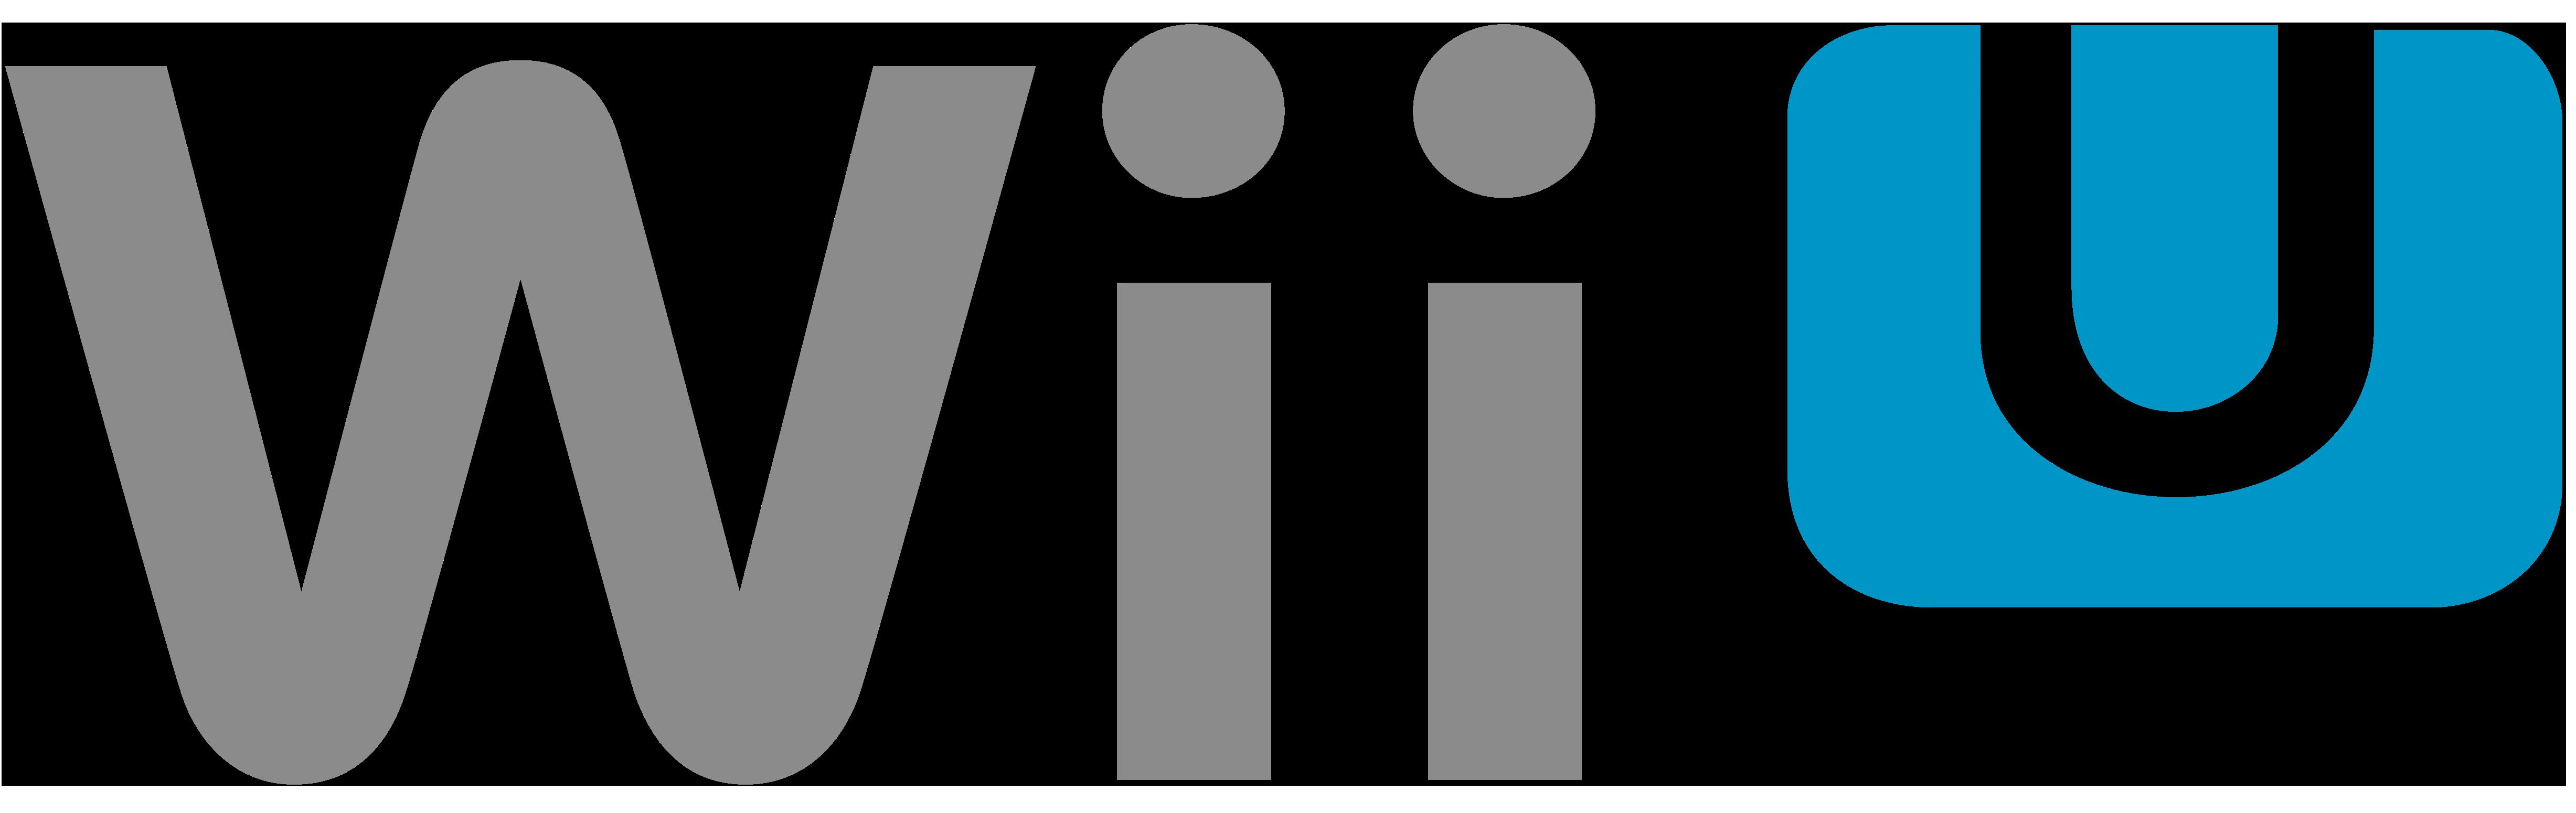 Wii_U_logo_WiiU.png